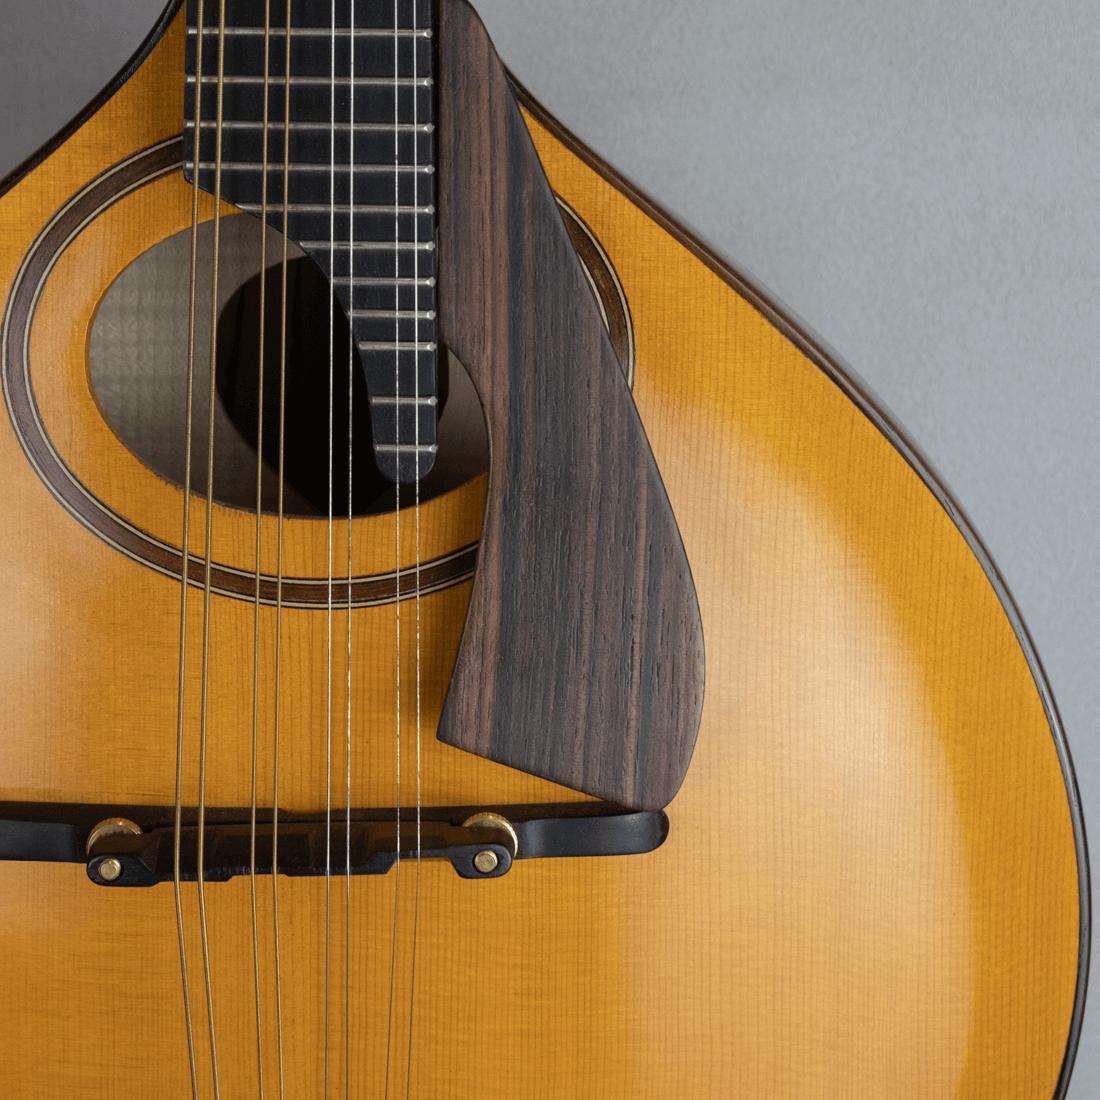 mandolin italian for concert ovalhole